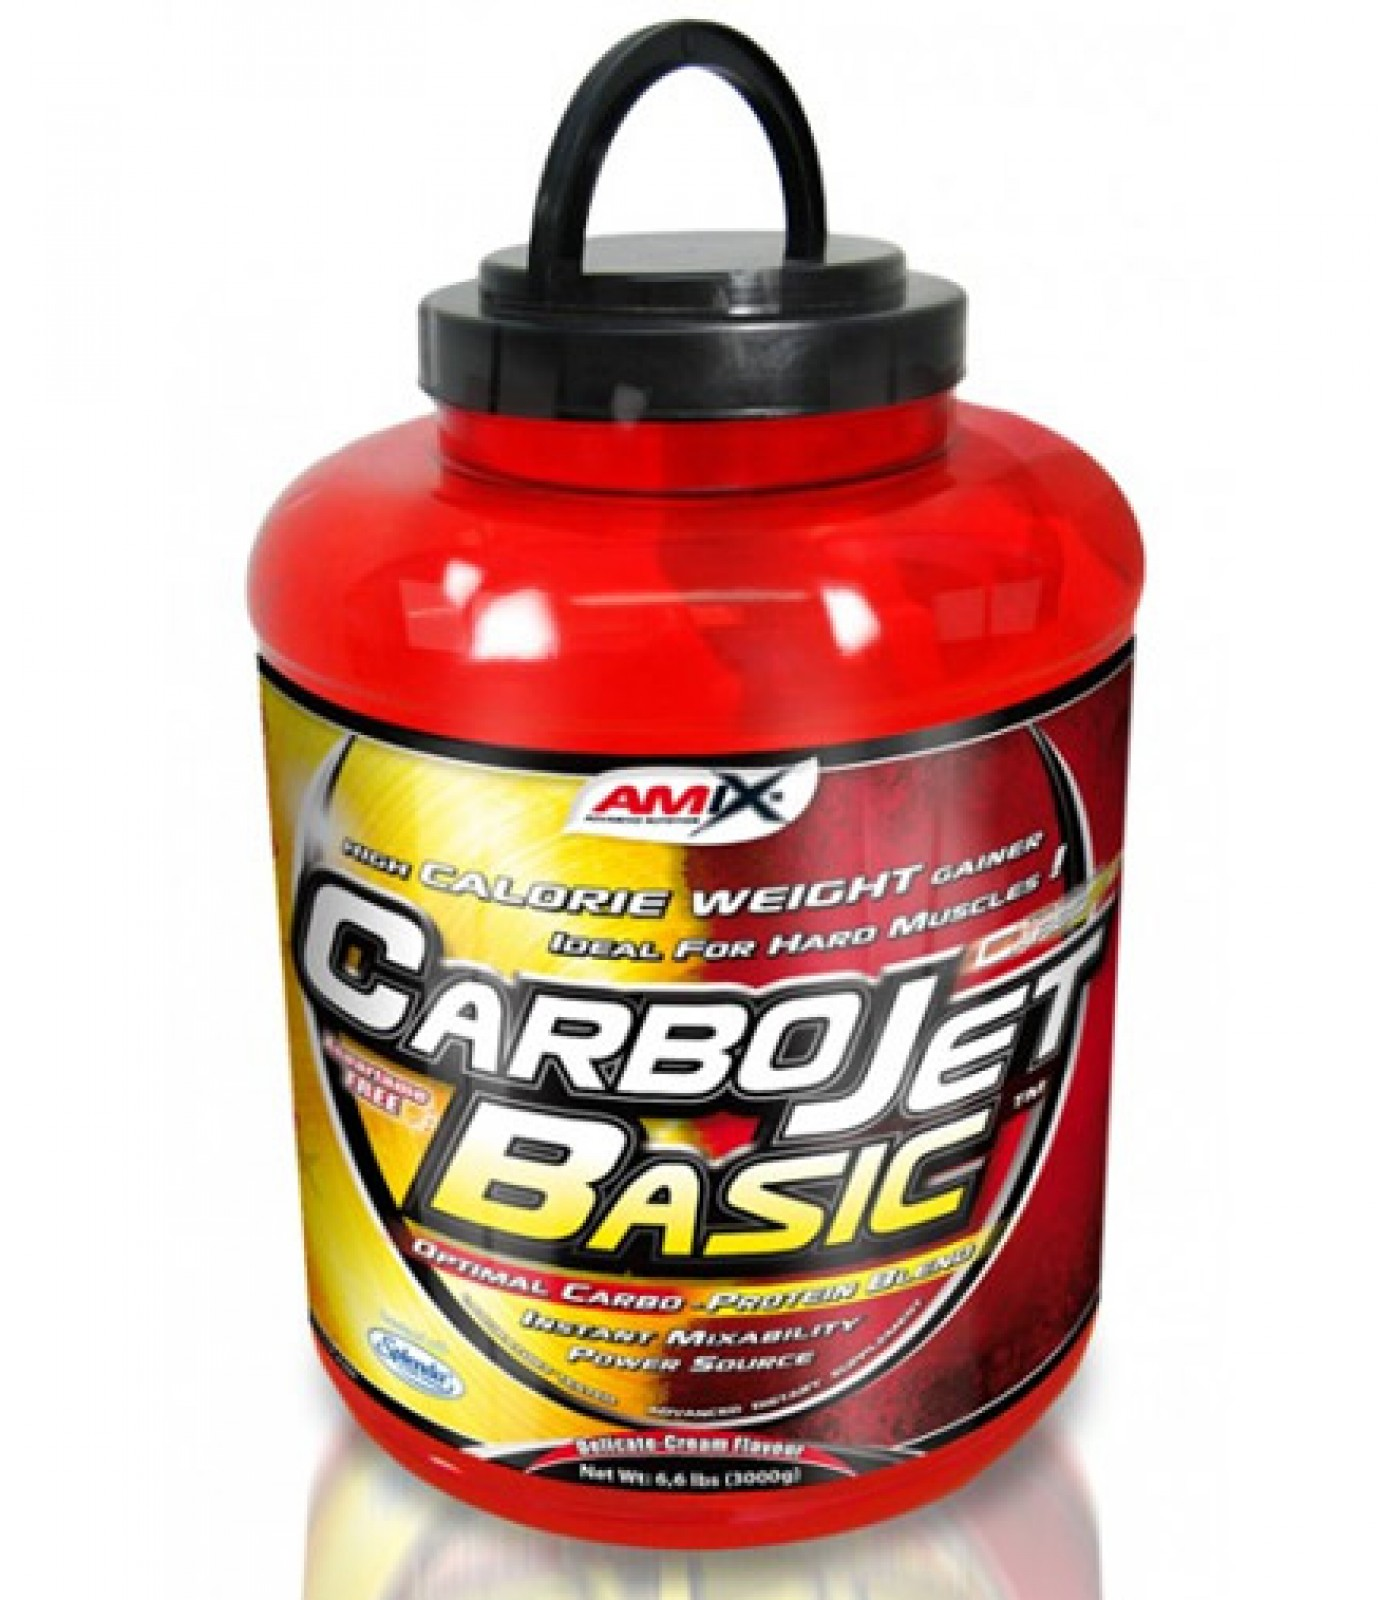 Amix - CarboJet ™ Basic / 3000gr.